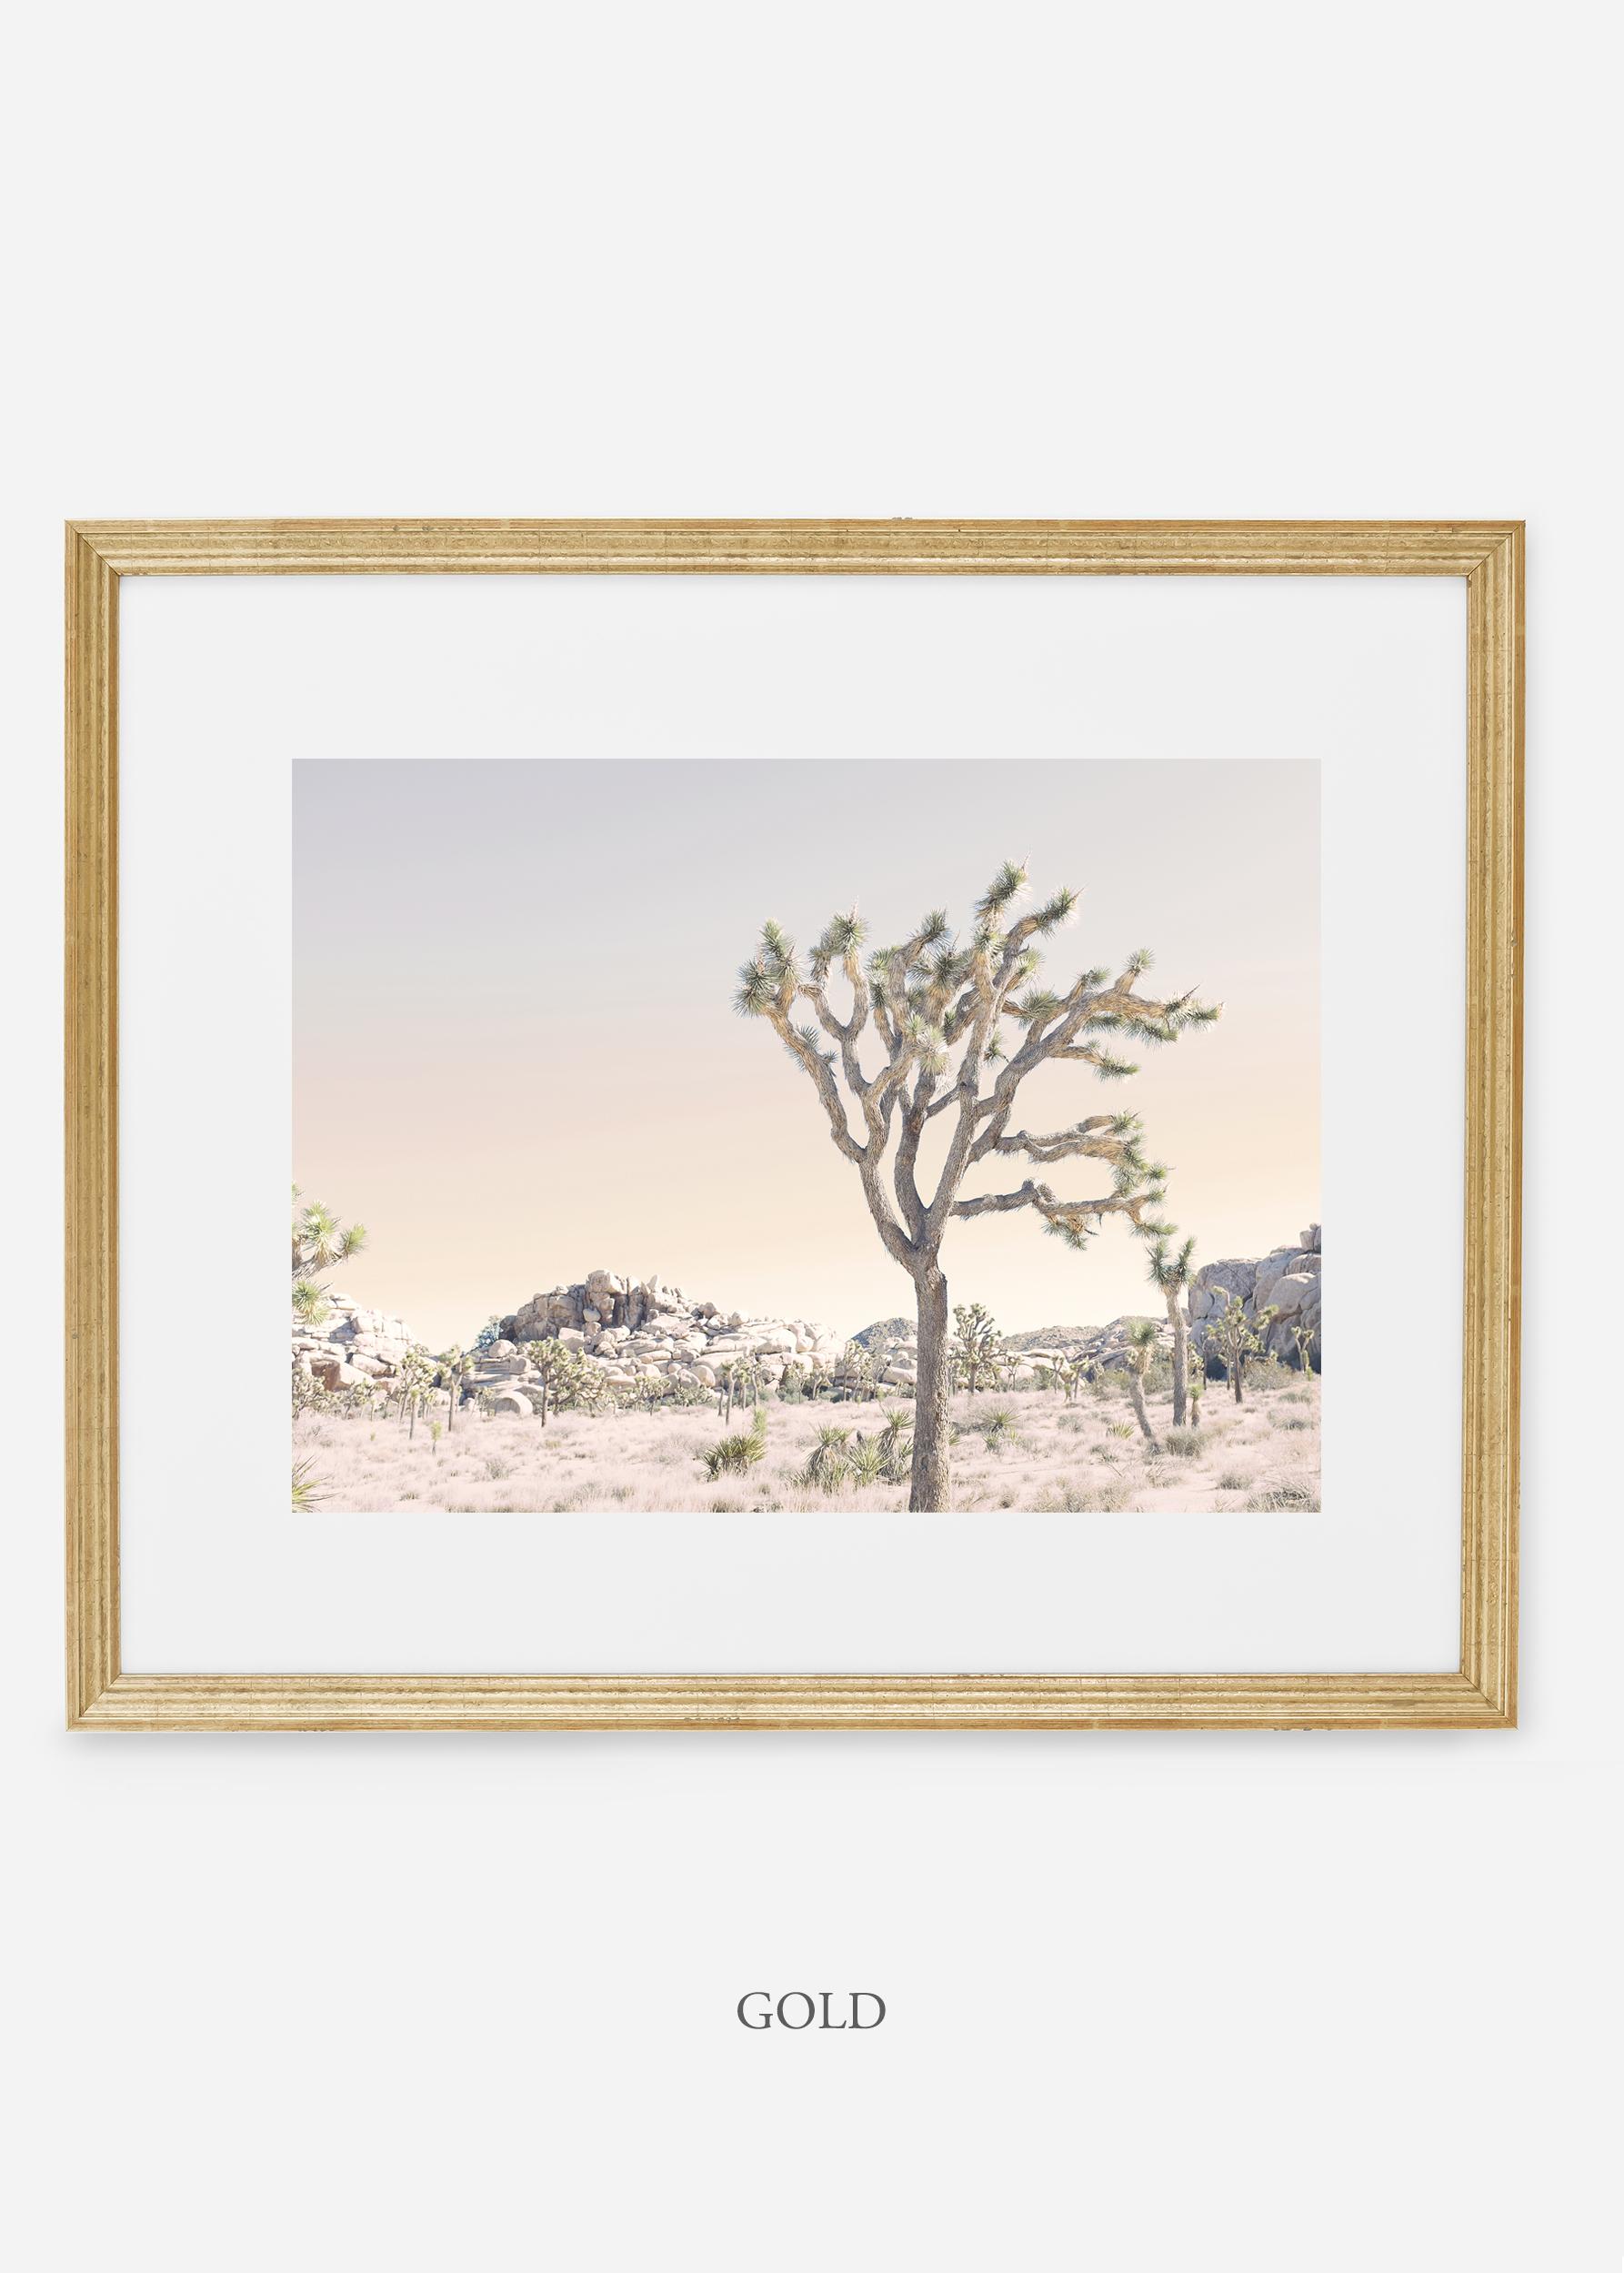 WilderCalifornia_goldframe_JoshuaTree_No.3_interiordesign_prints_art.jpg